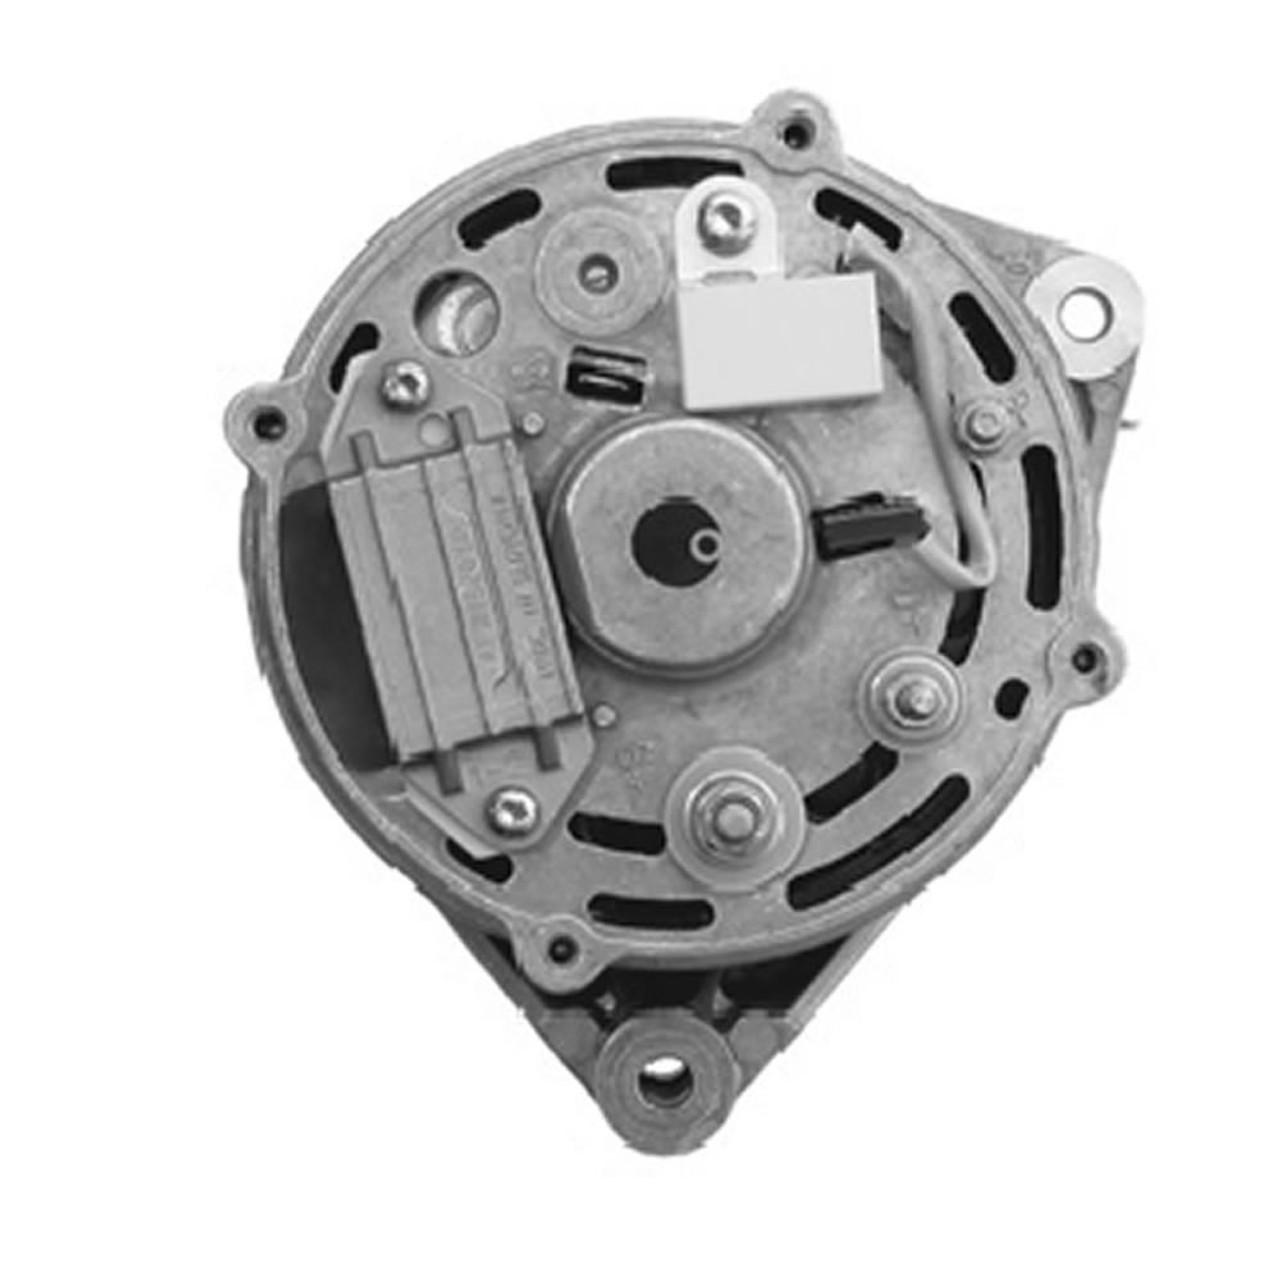 Deutz Faher Combines Letrika Alternator MG209